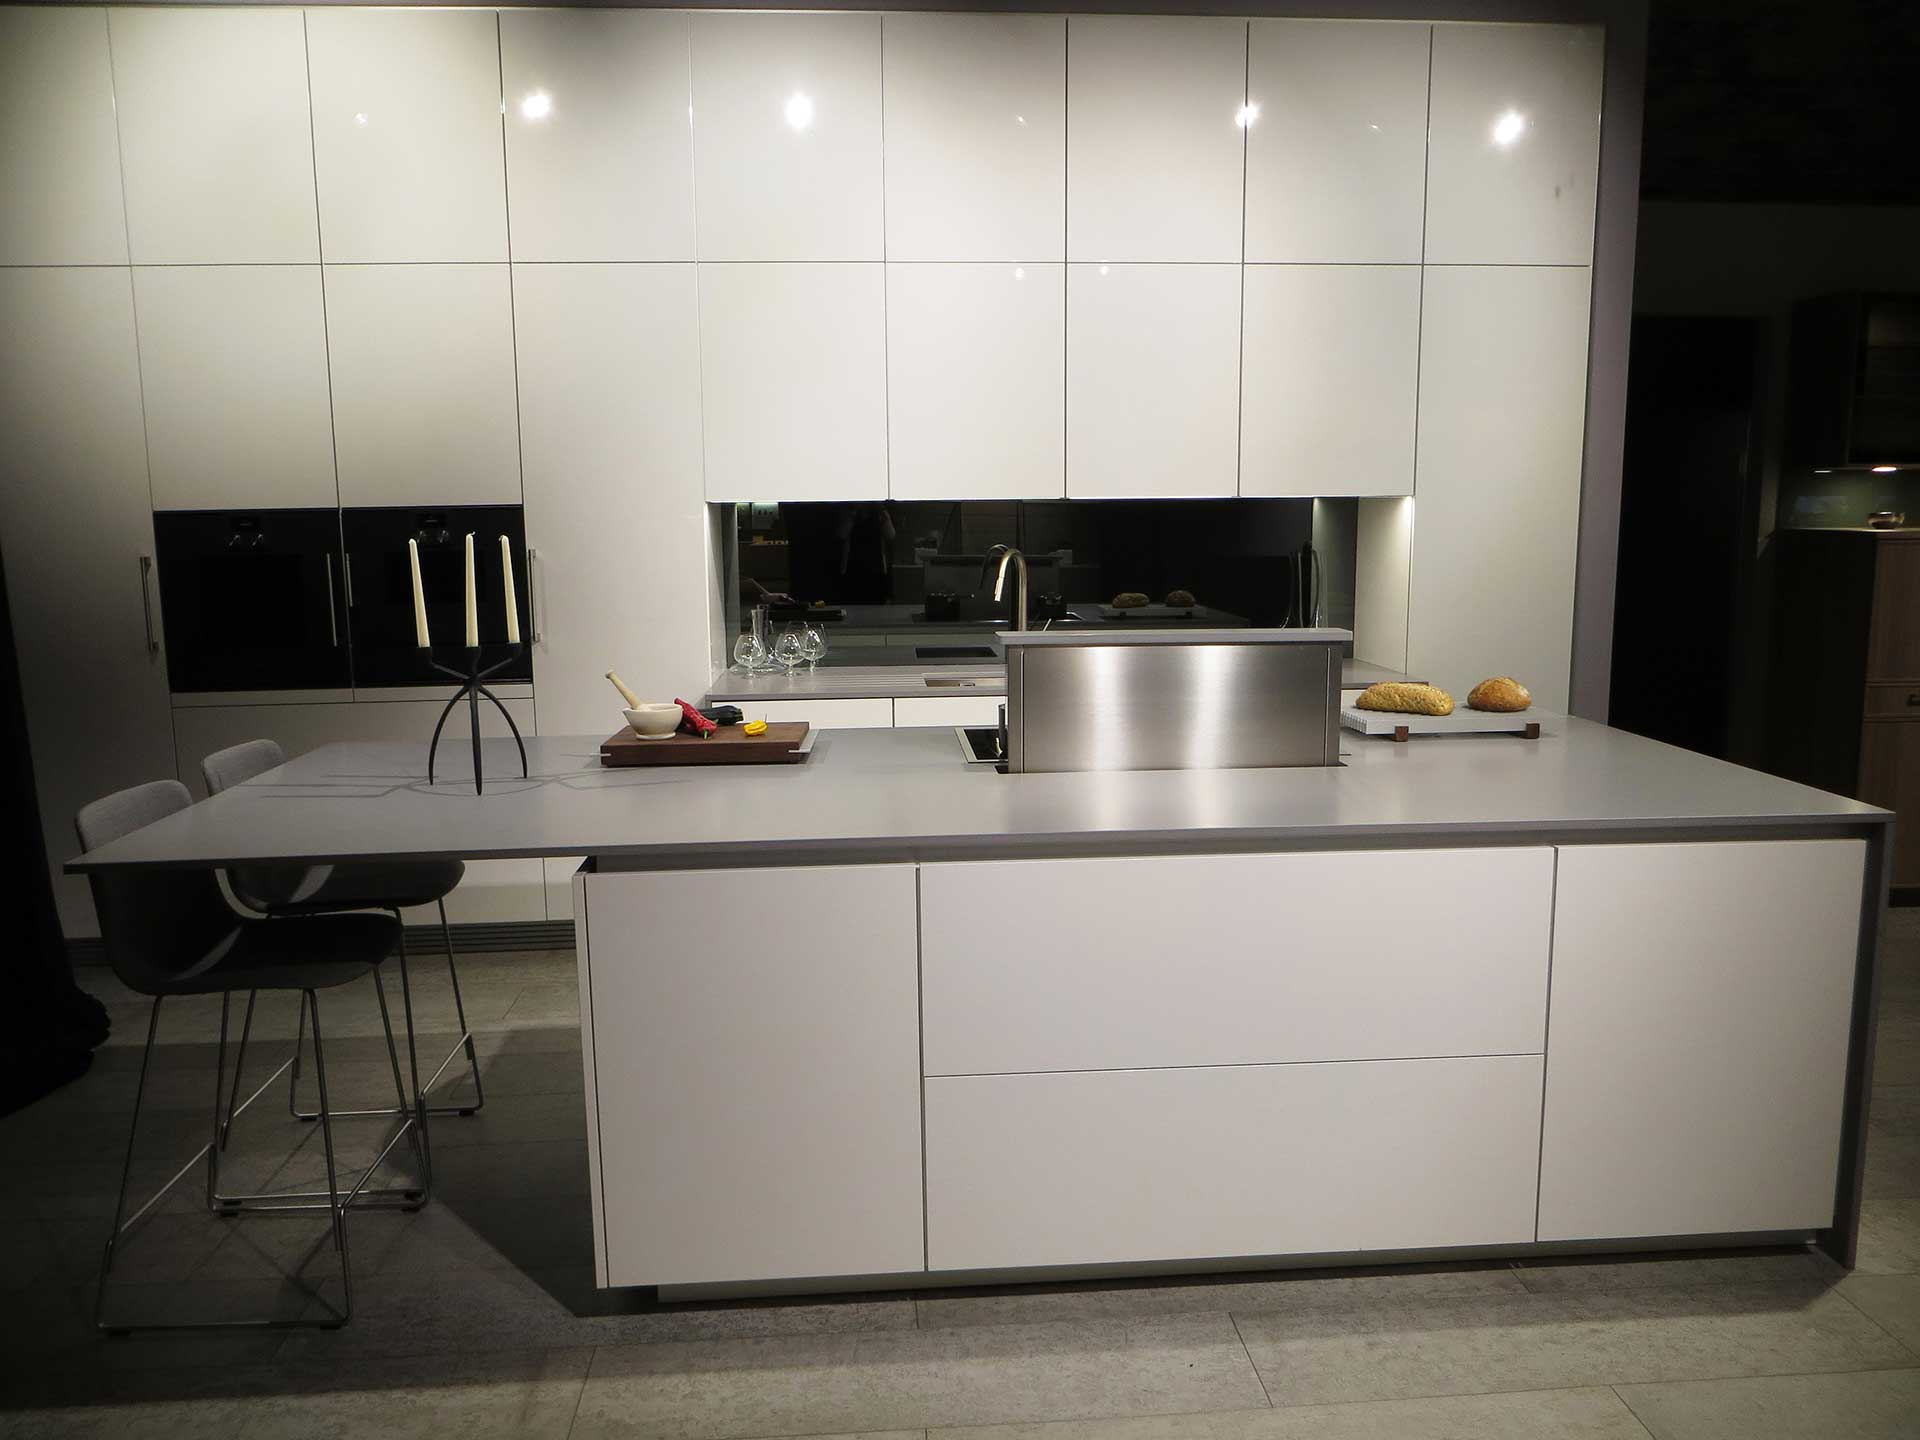 lapitec kitchen1